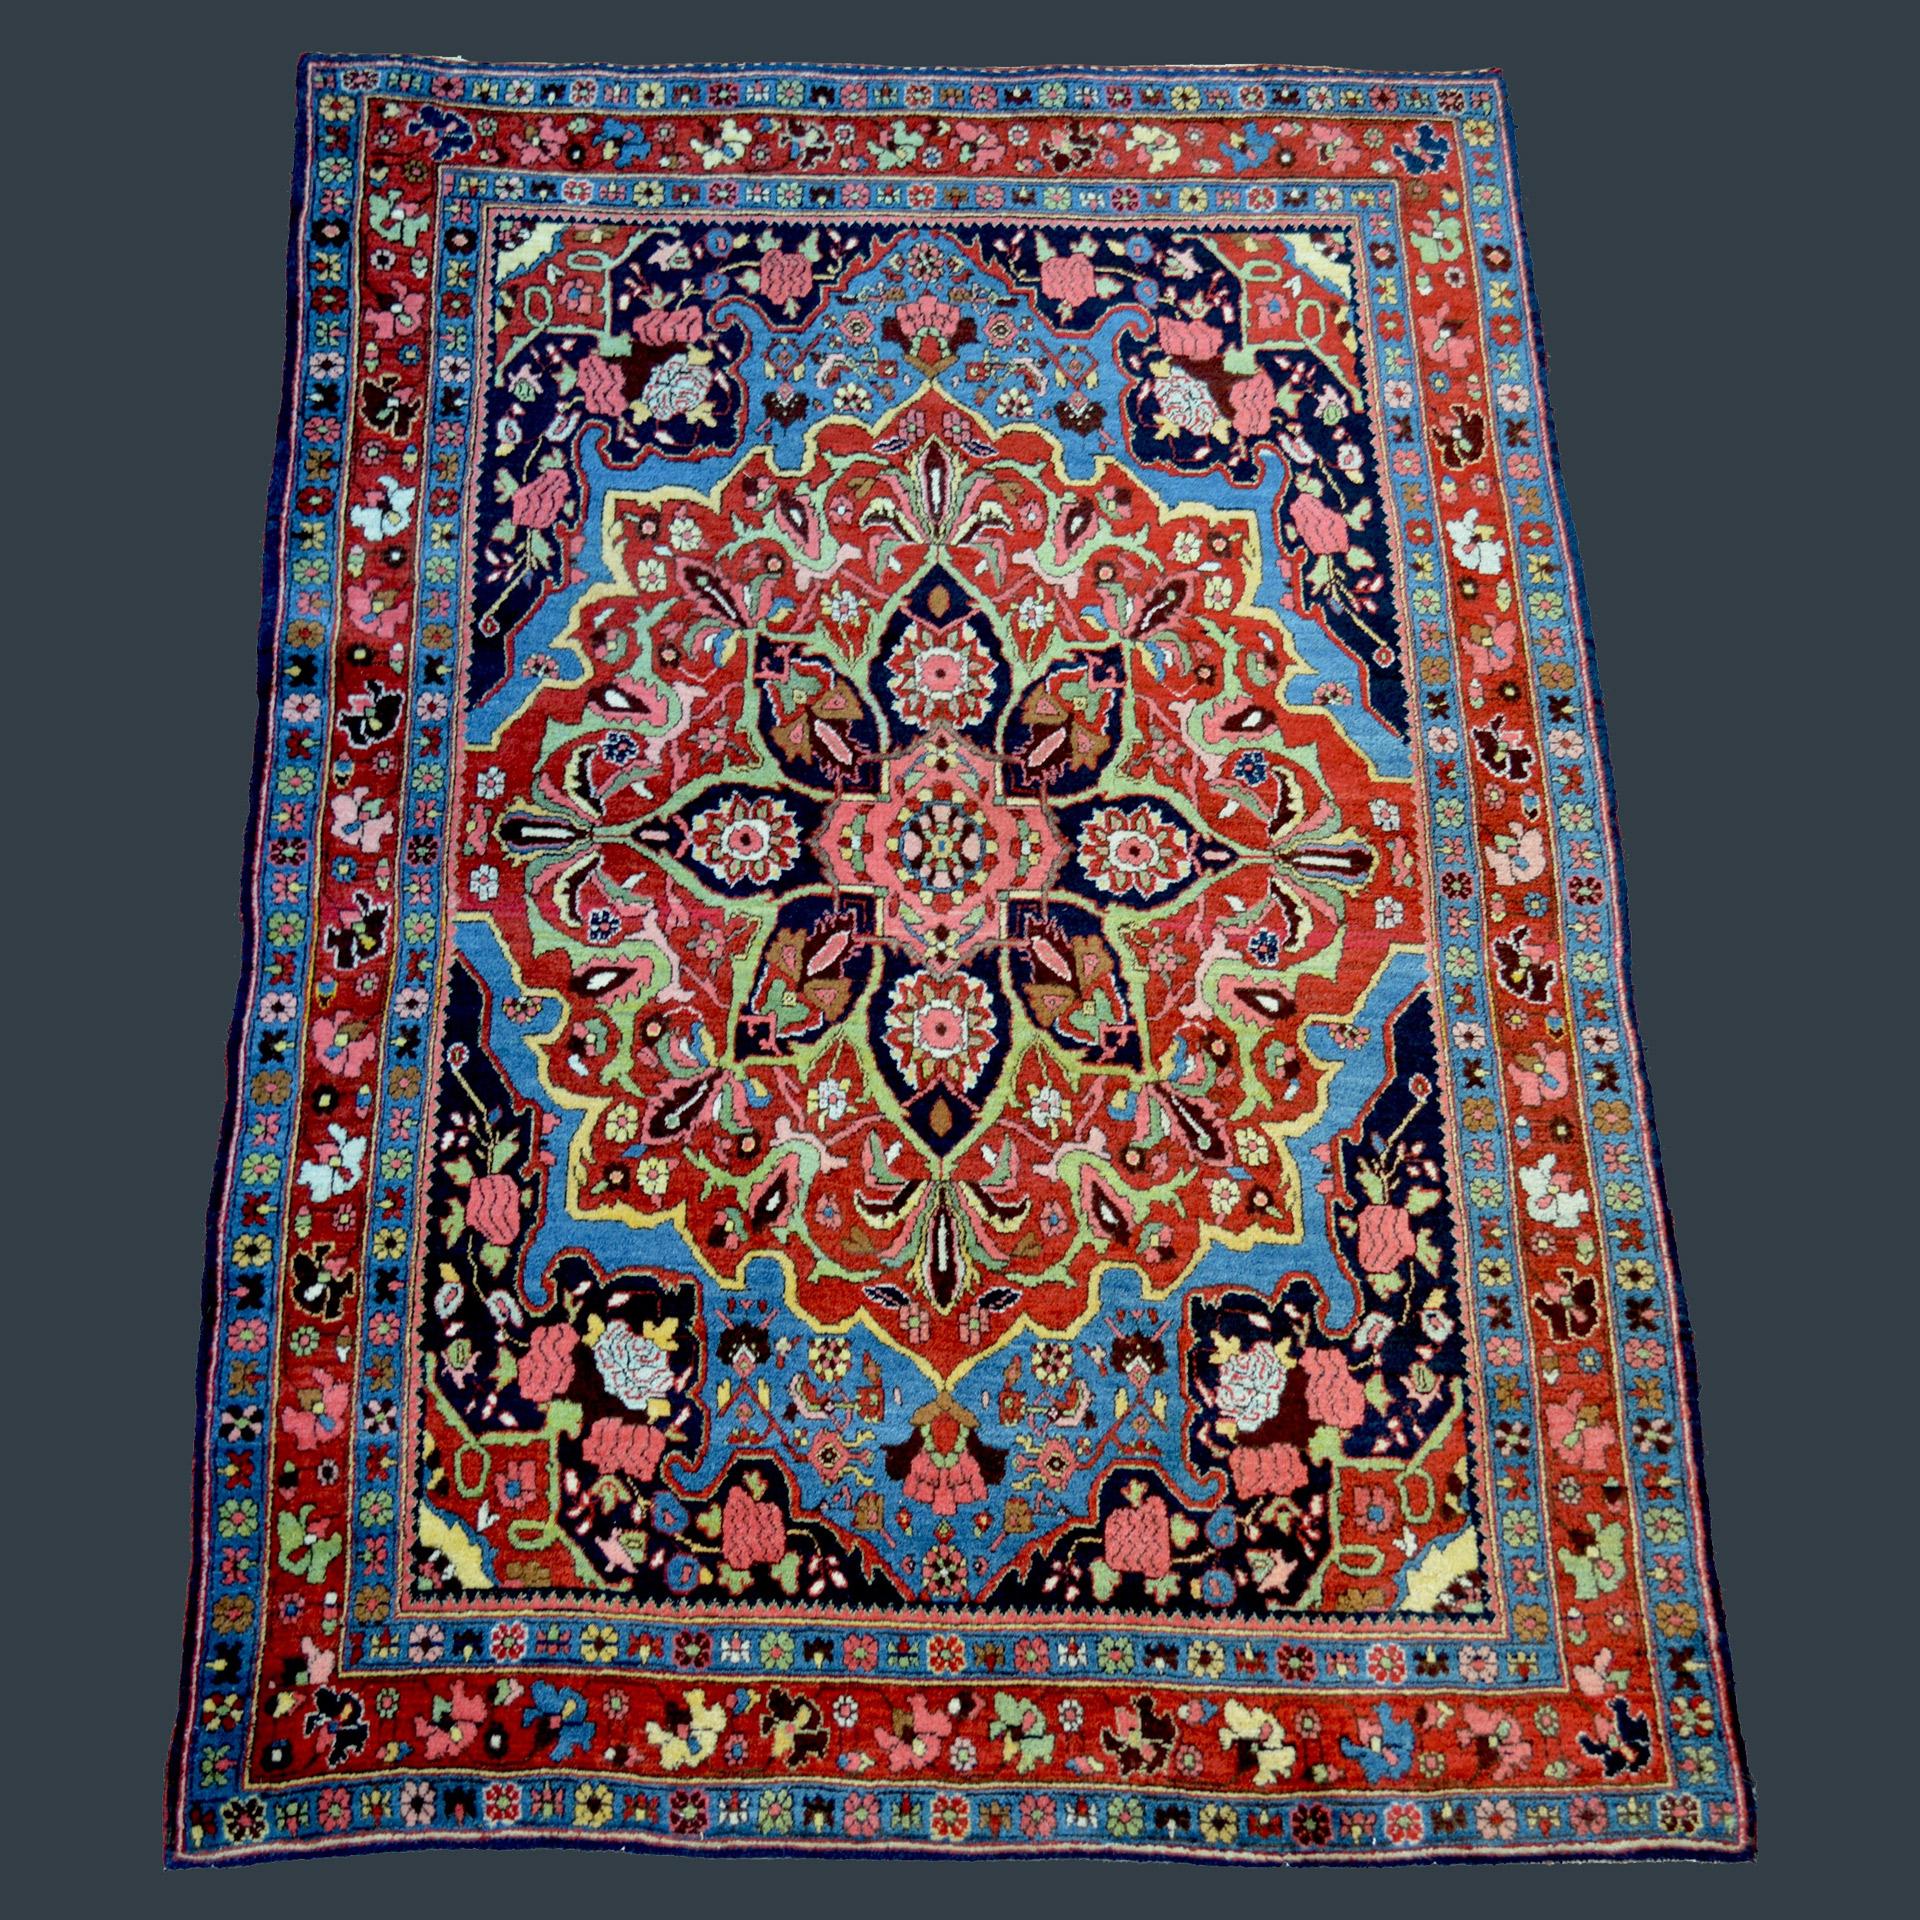 Antique Bidjar rug with deep sky blue field